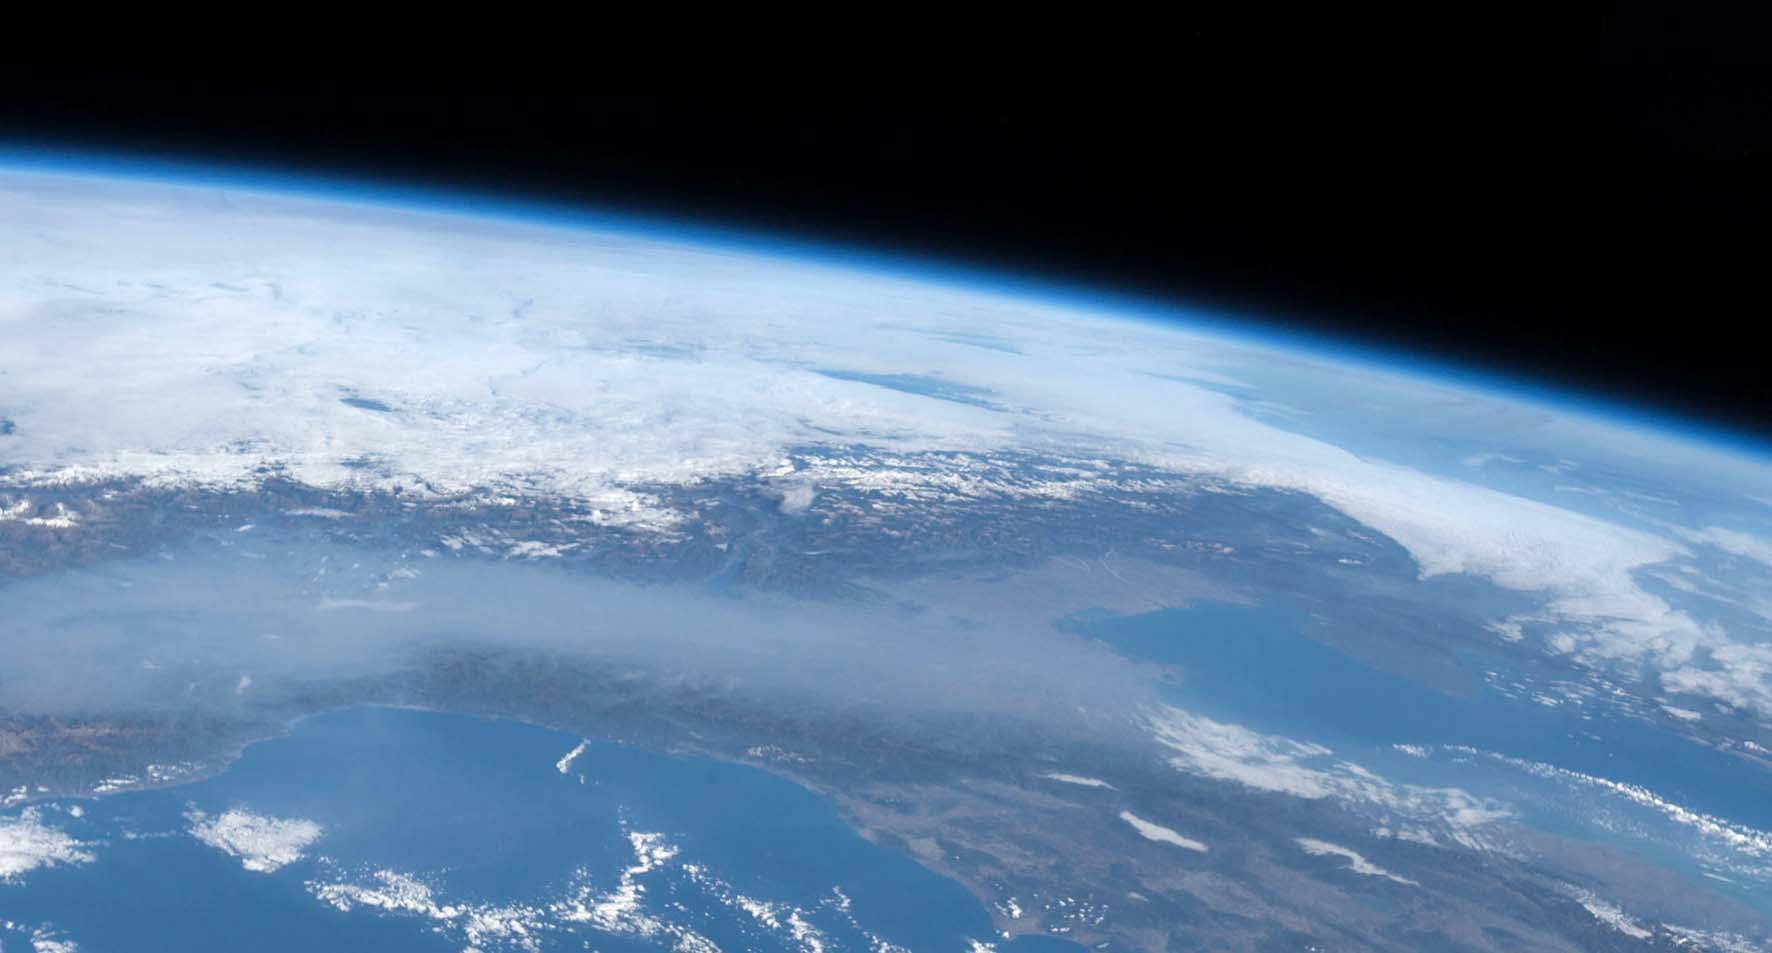 italia dal satellite smog pianura padana 3